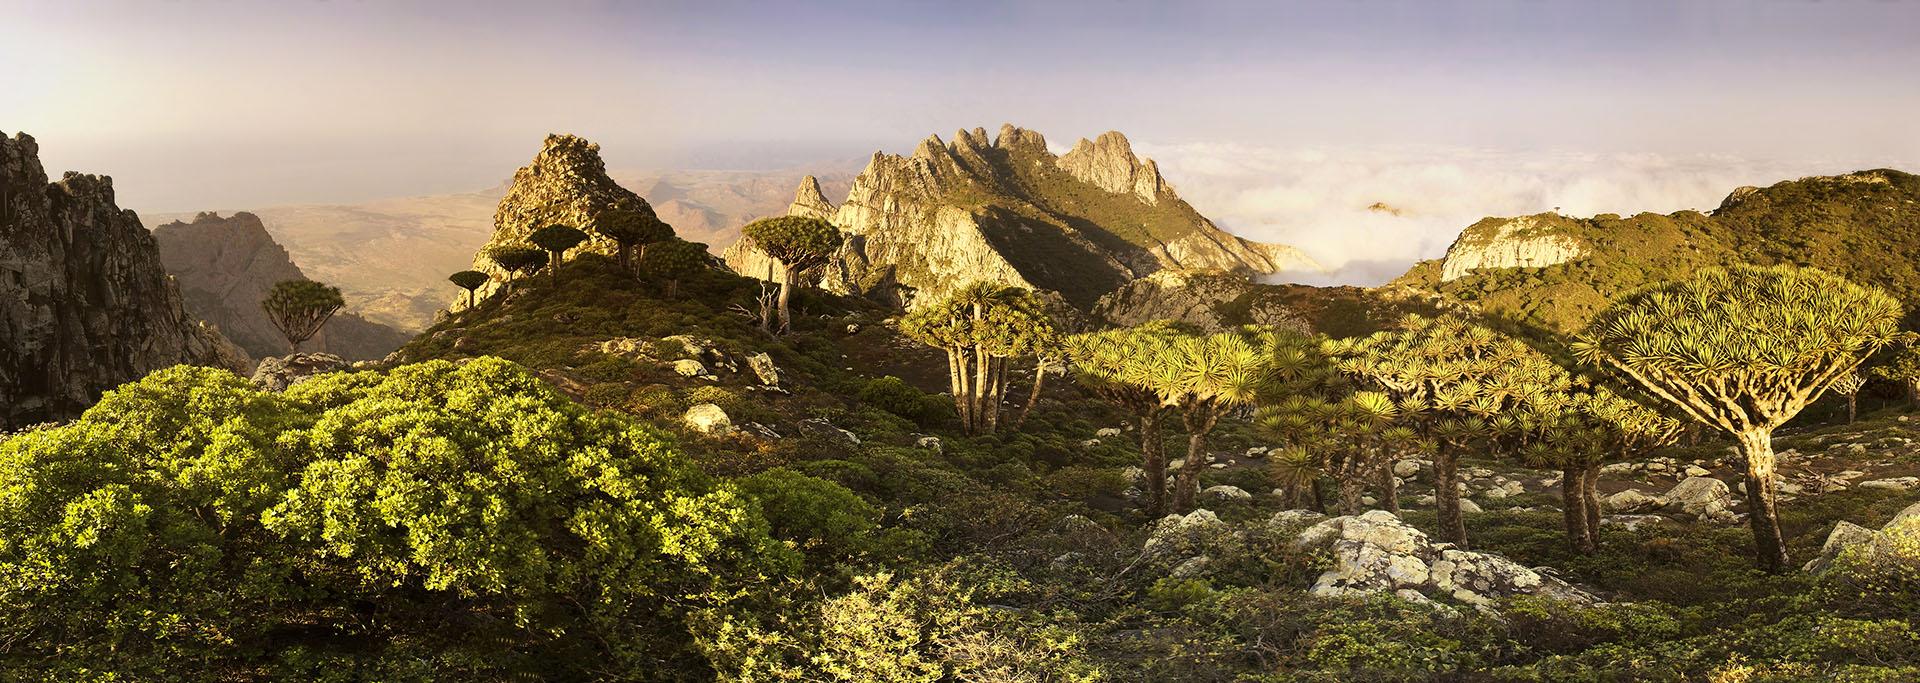 Panorama de Socotra, Yémen